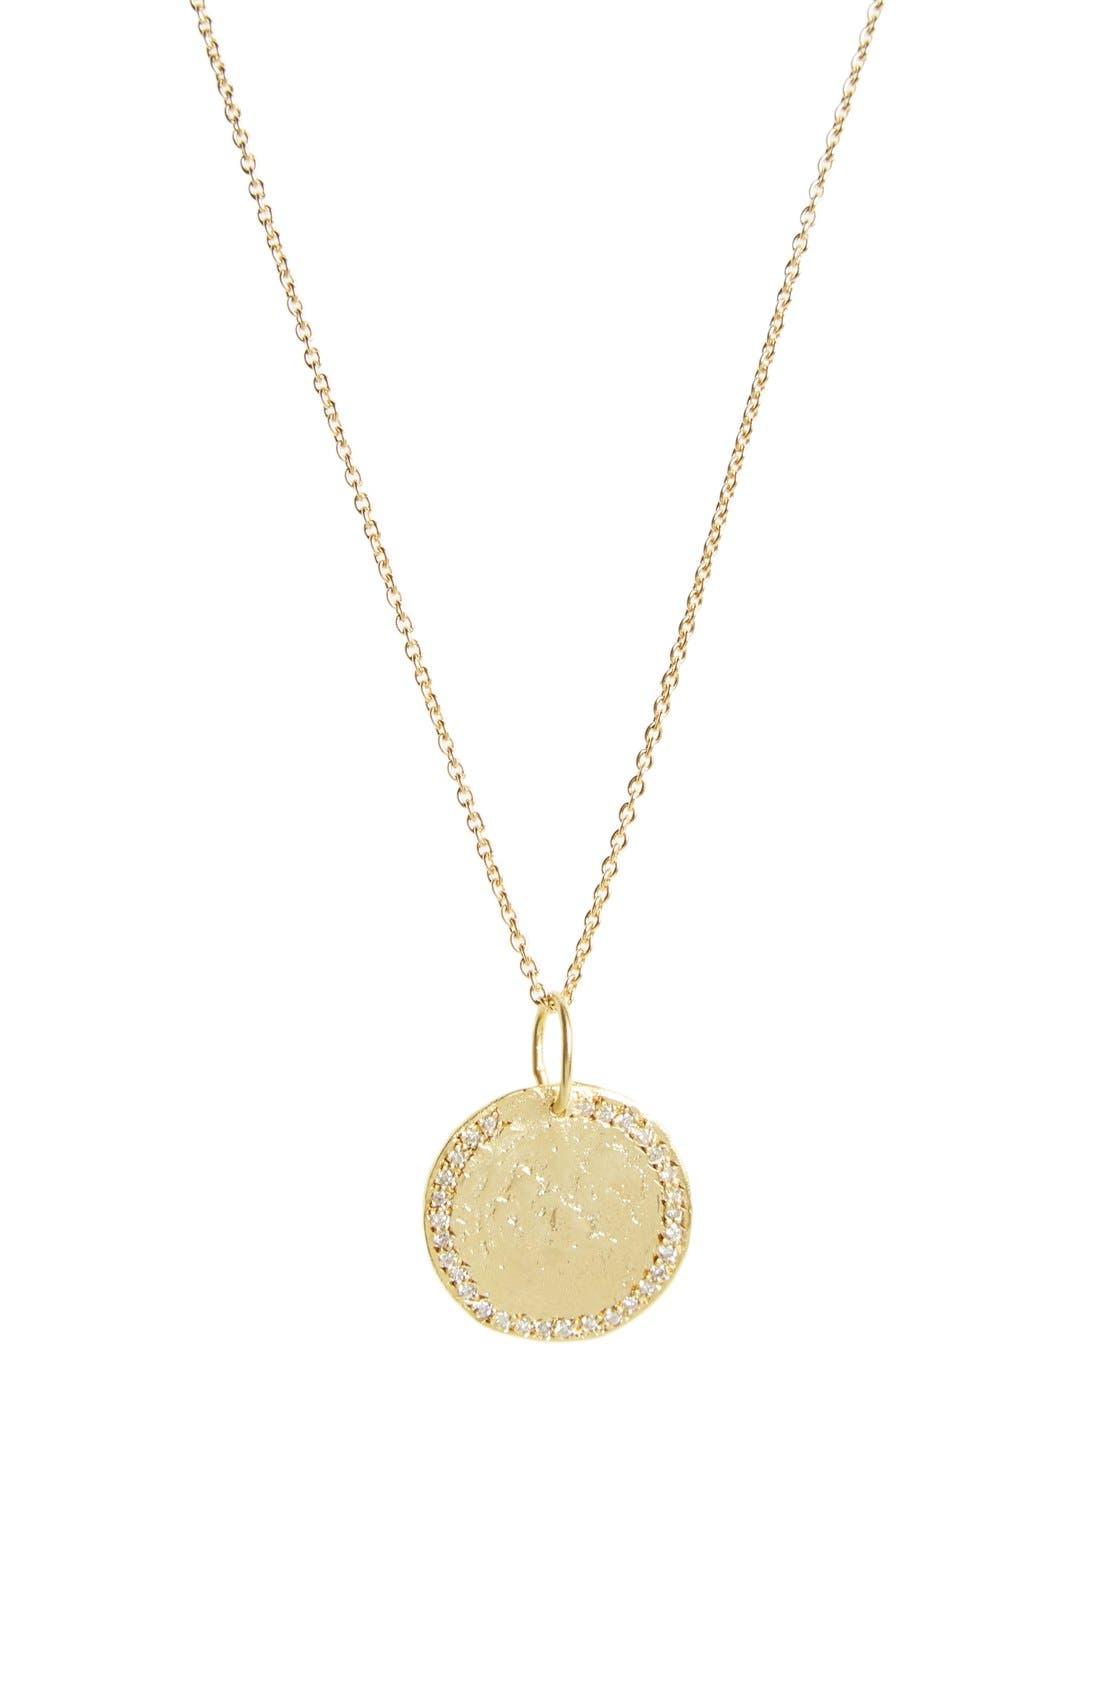 LARA MELCHIOR 'Sautoir III' Diamond & Vermeil Pendant